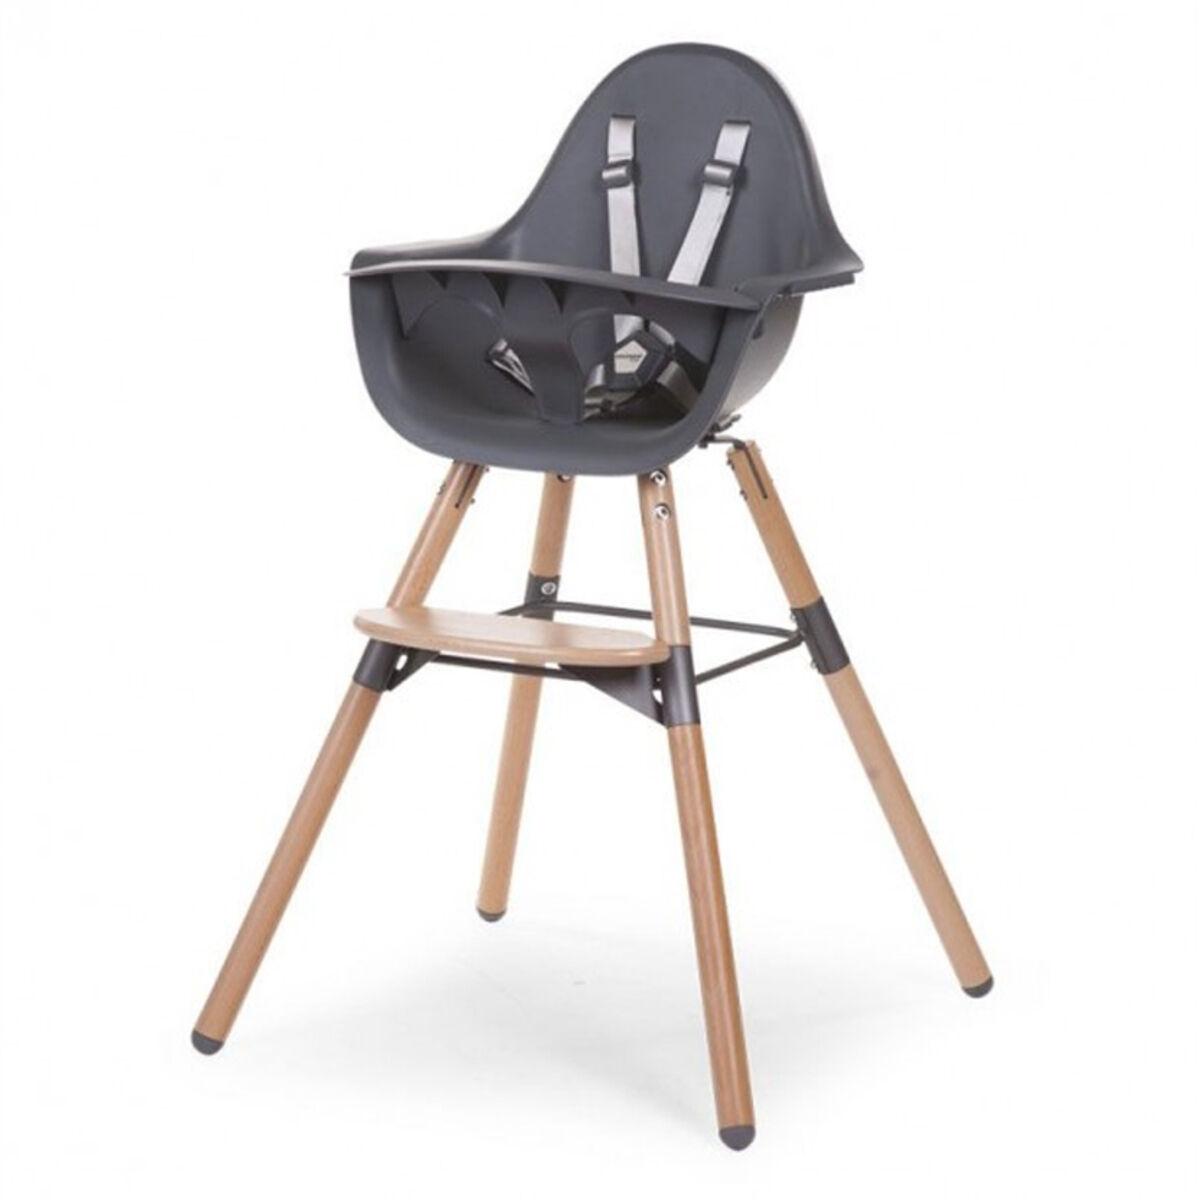 childhome chaise haute evolu 2 - bois et anthracite